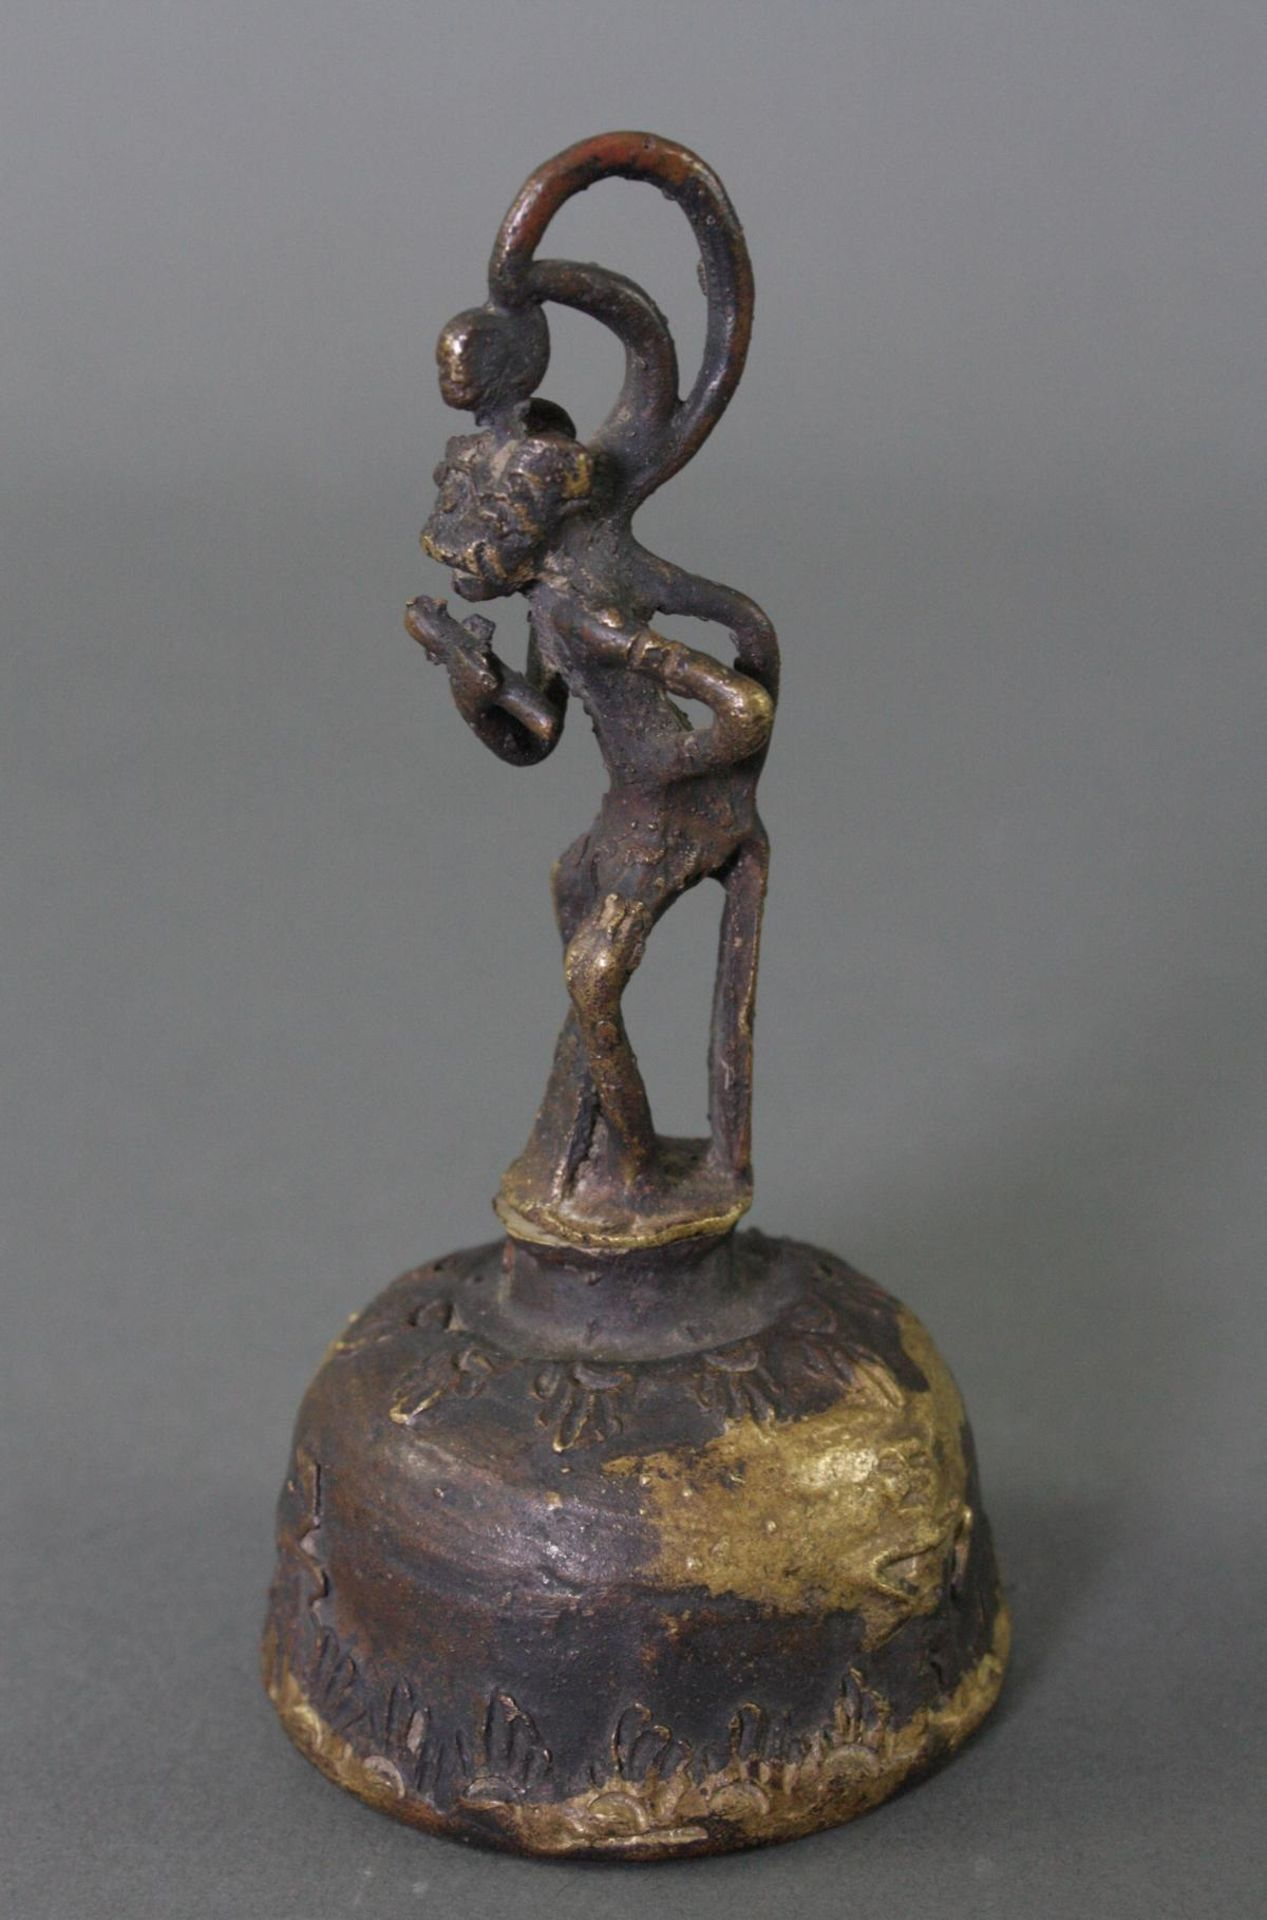 Hanuman-Glocke, Indien 19. Jahrhundert - Bild 2 aus 5